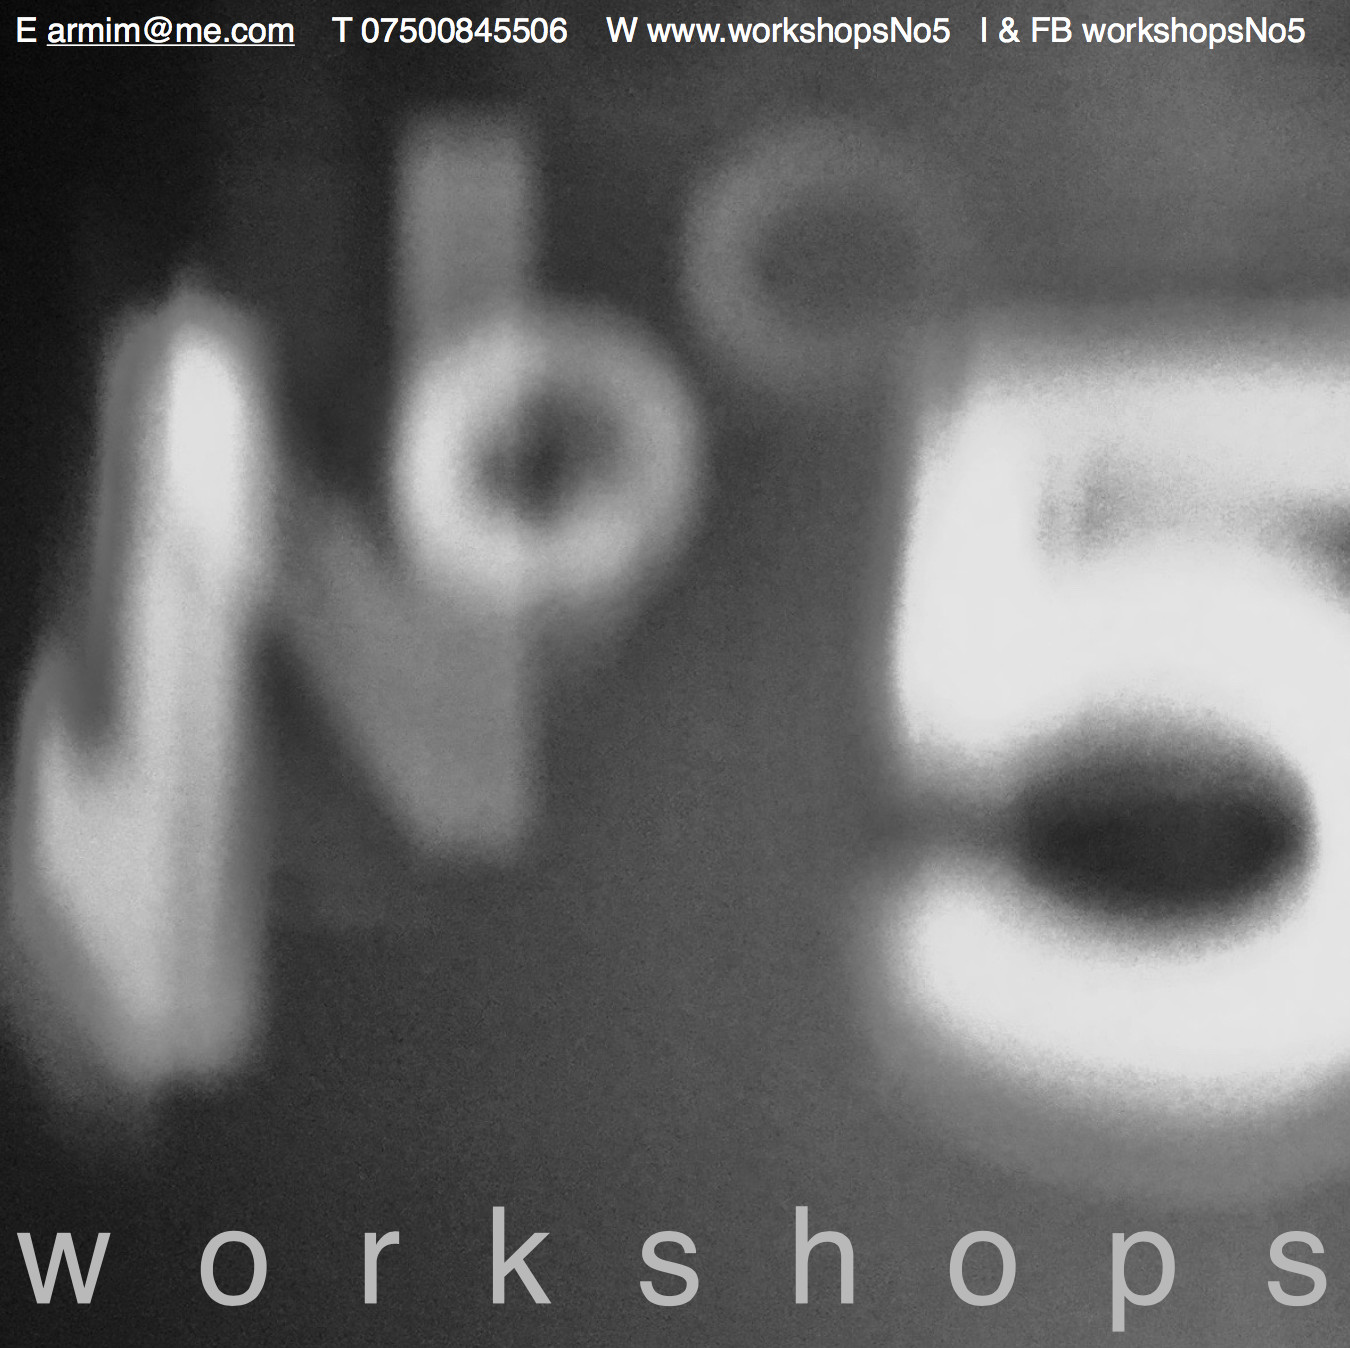 Mono Printing Workshop by no5workshops - art in London